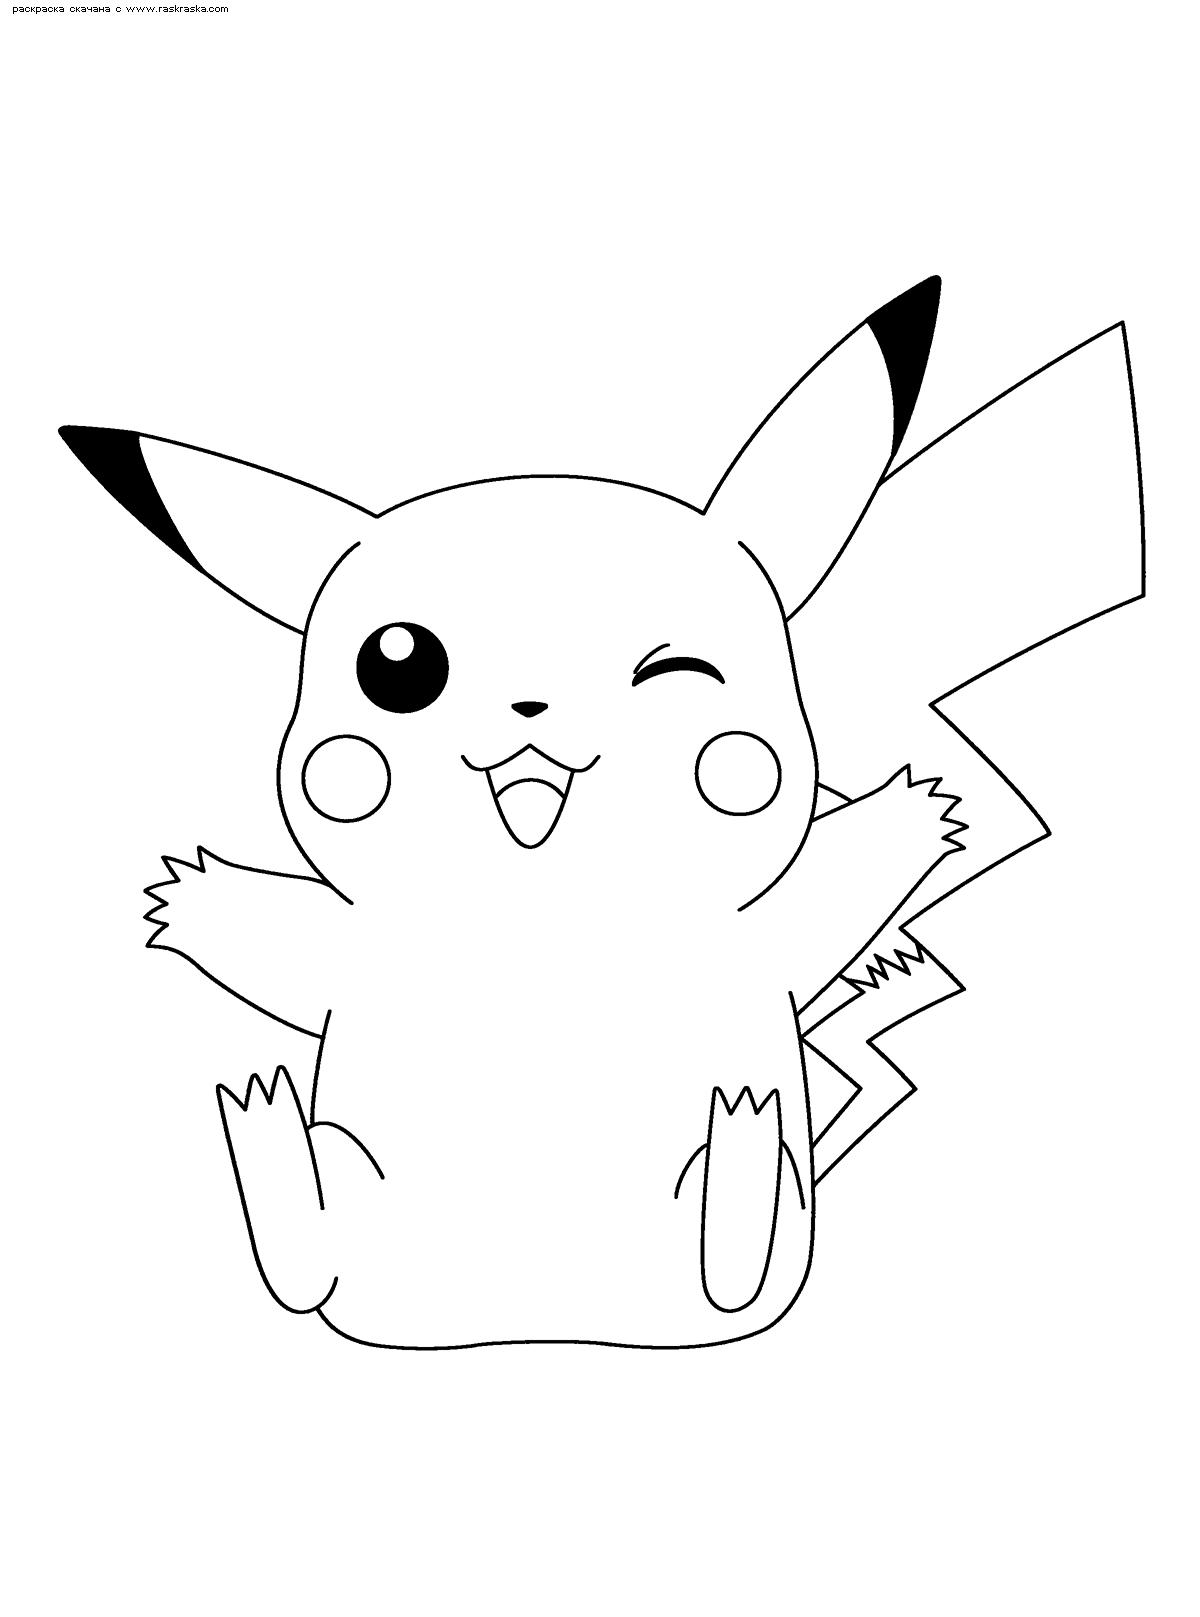 Раскраска Пикачу подмигивает | Раскраски Пикачу (Pikachu)